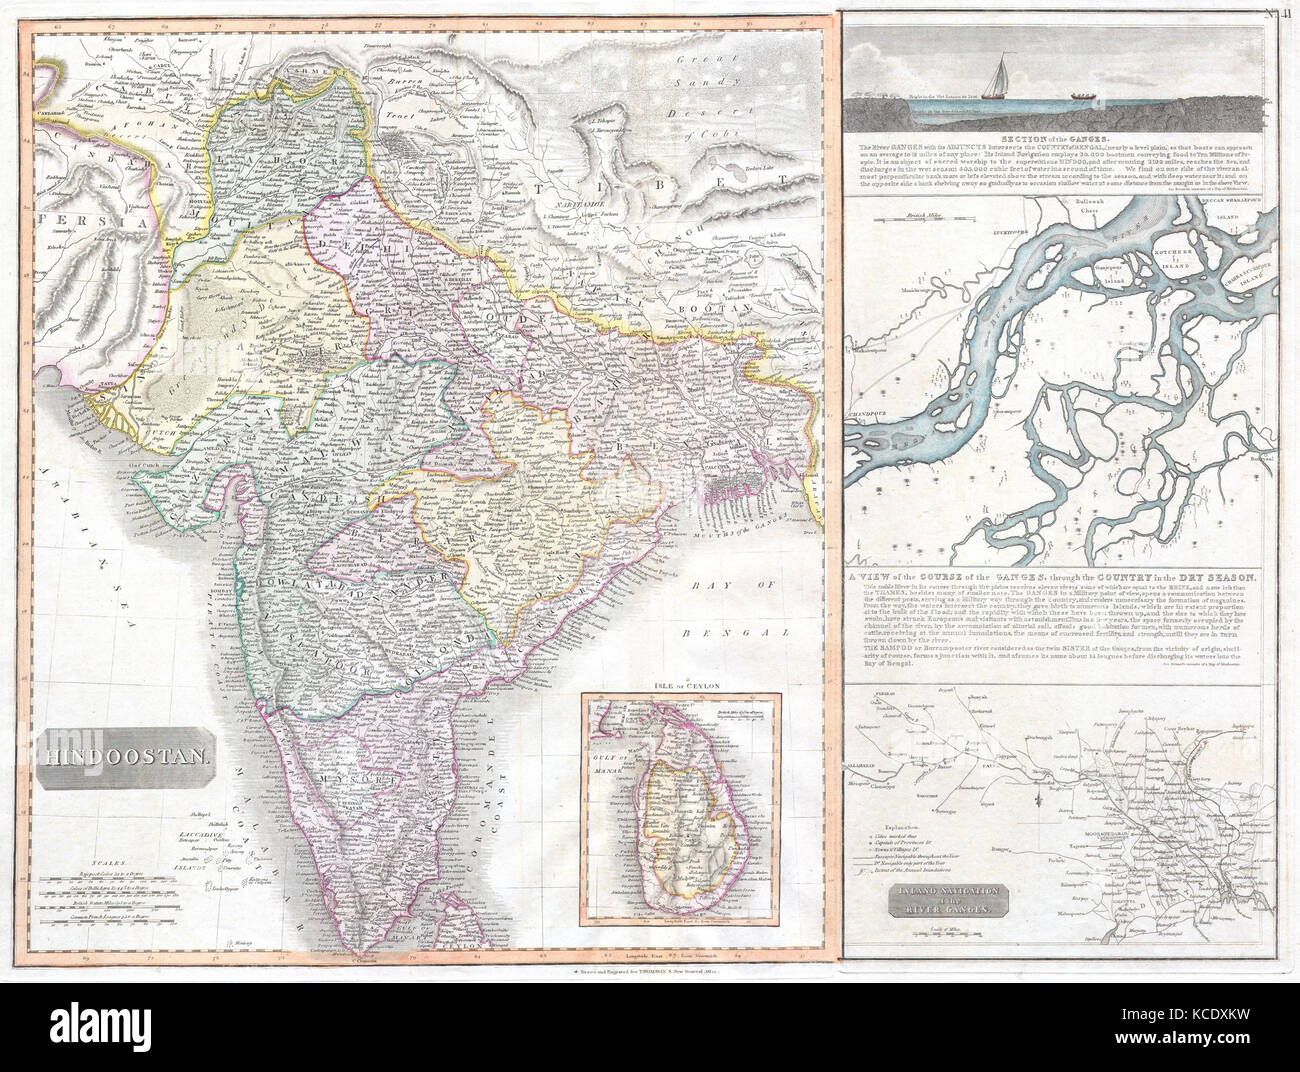 India Map Ganges Stockfotos & India Map Ganges Bilder - Alamy